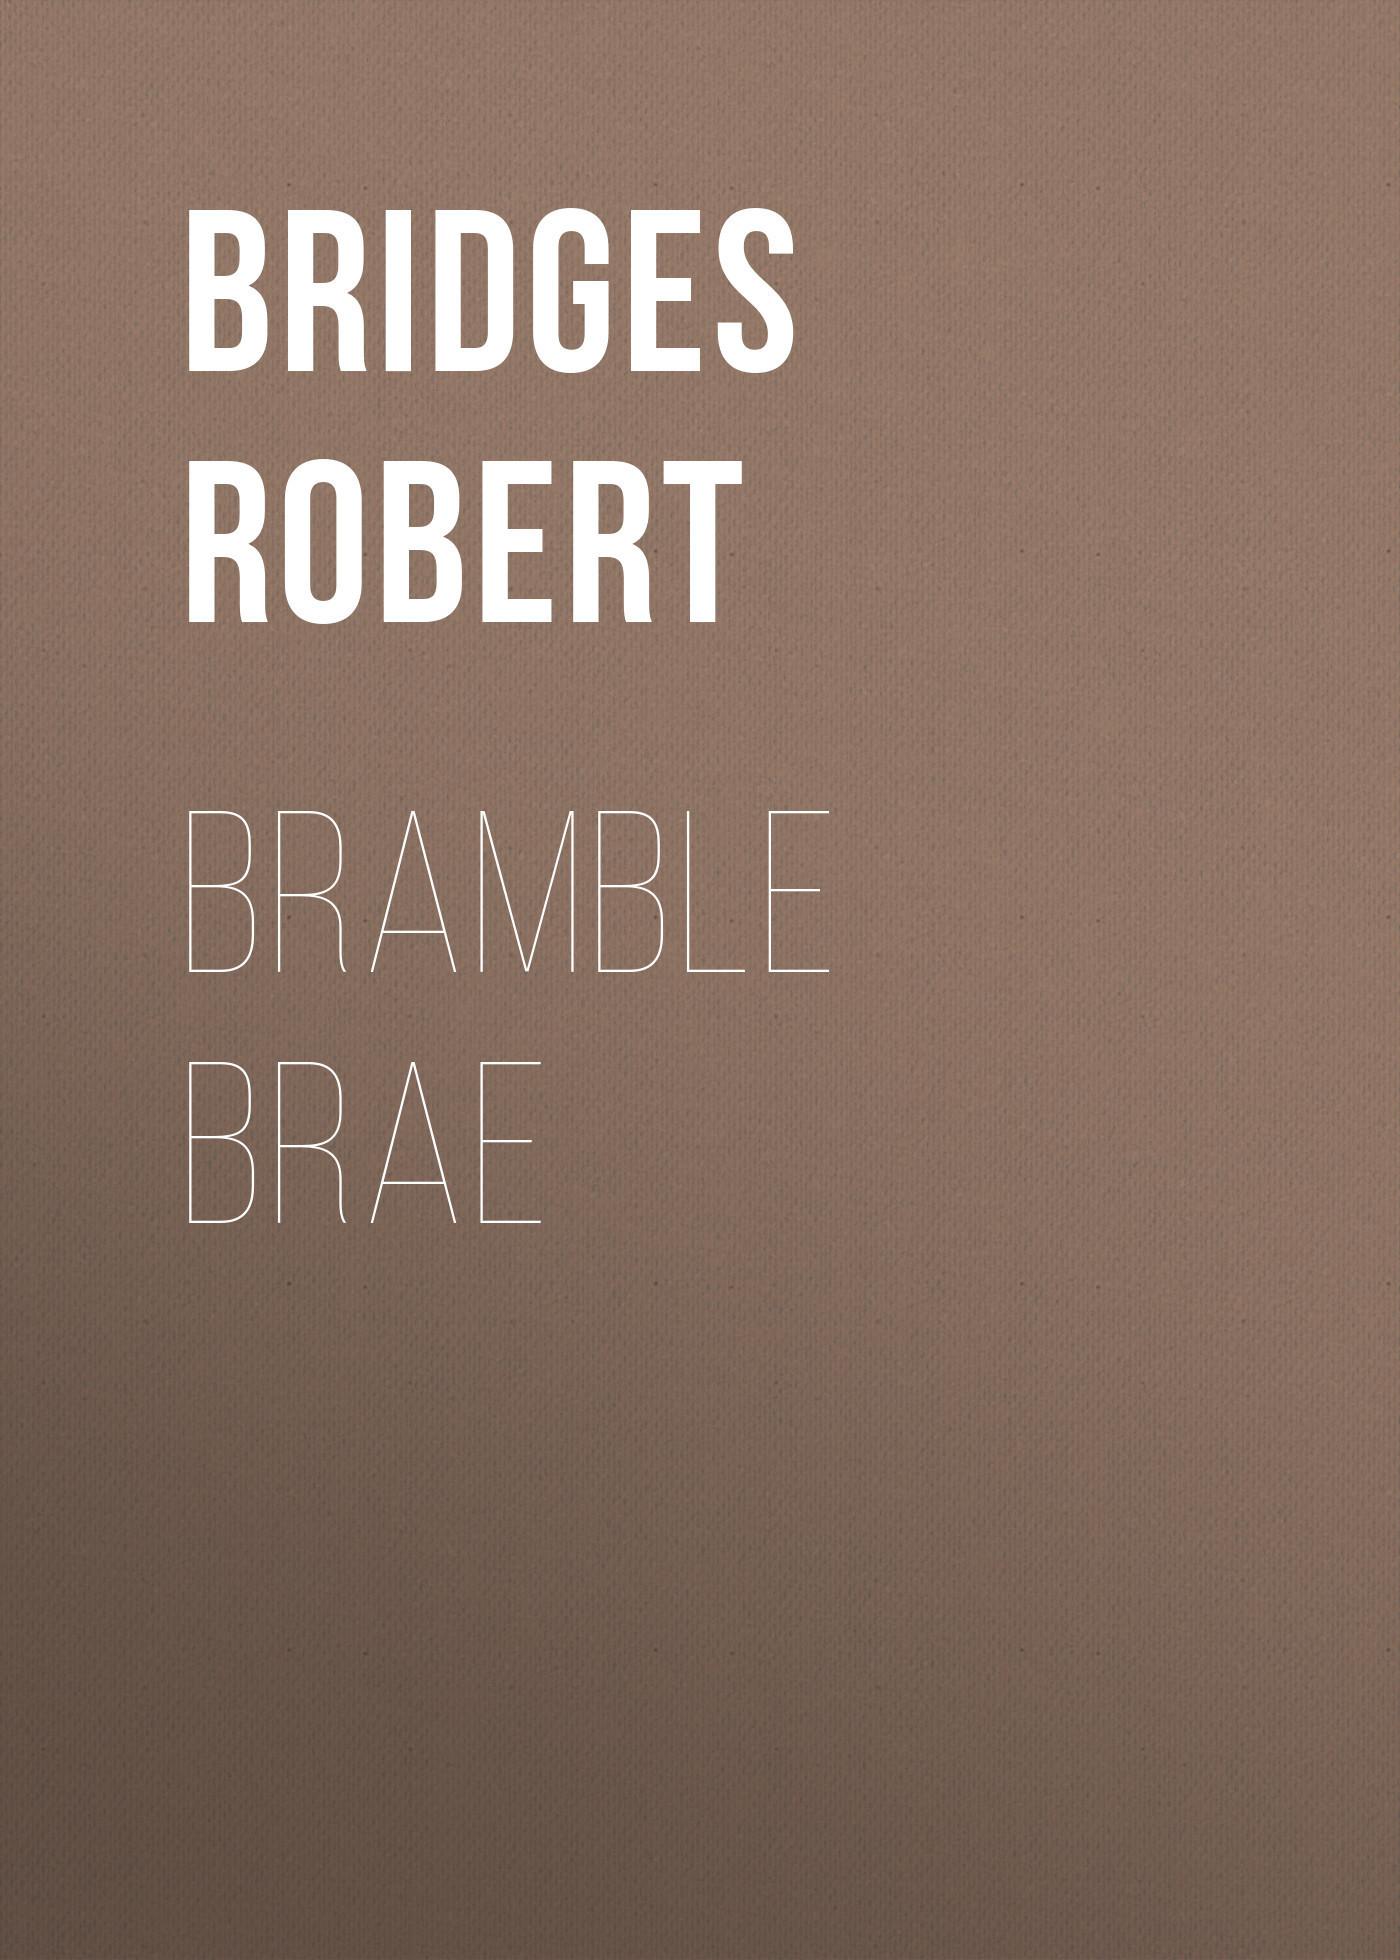 Bridges Robert Bramble Brae